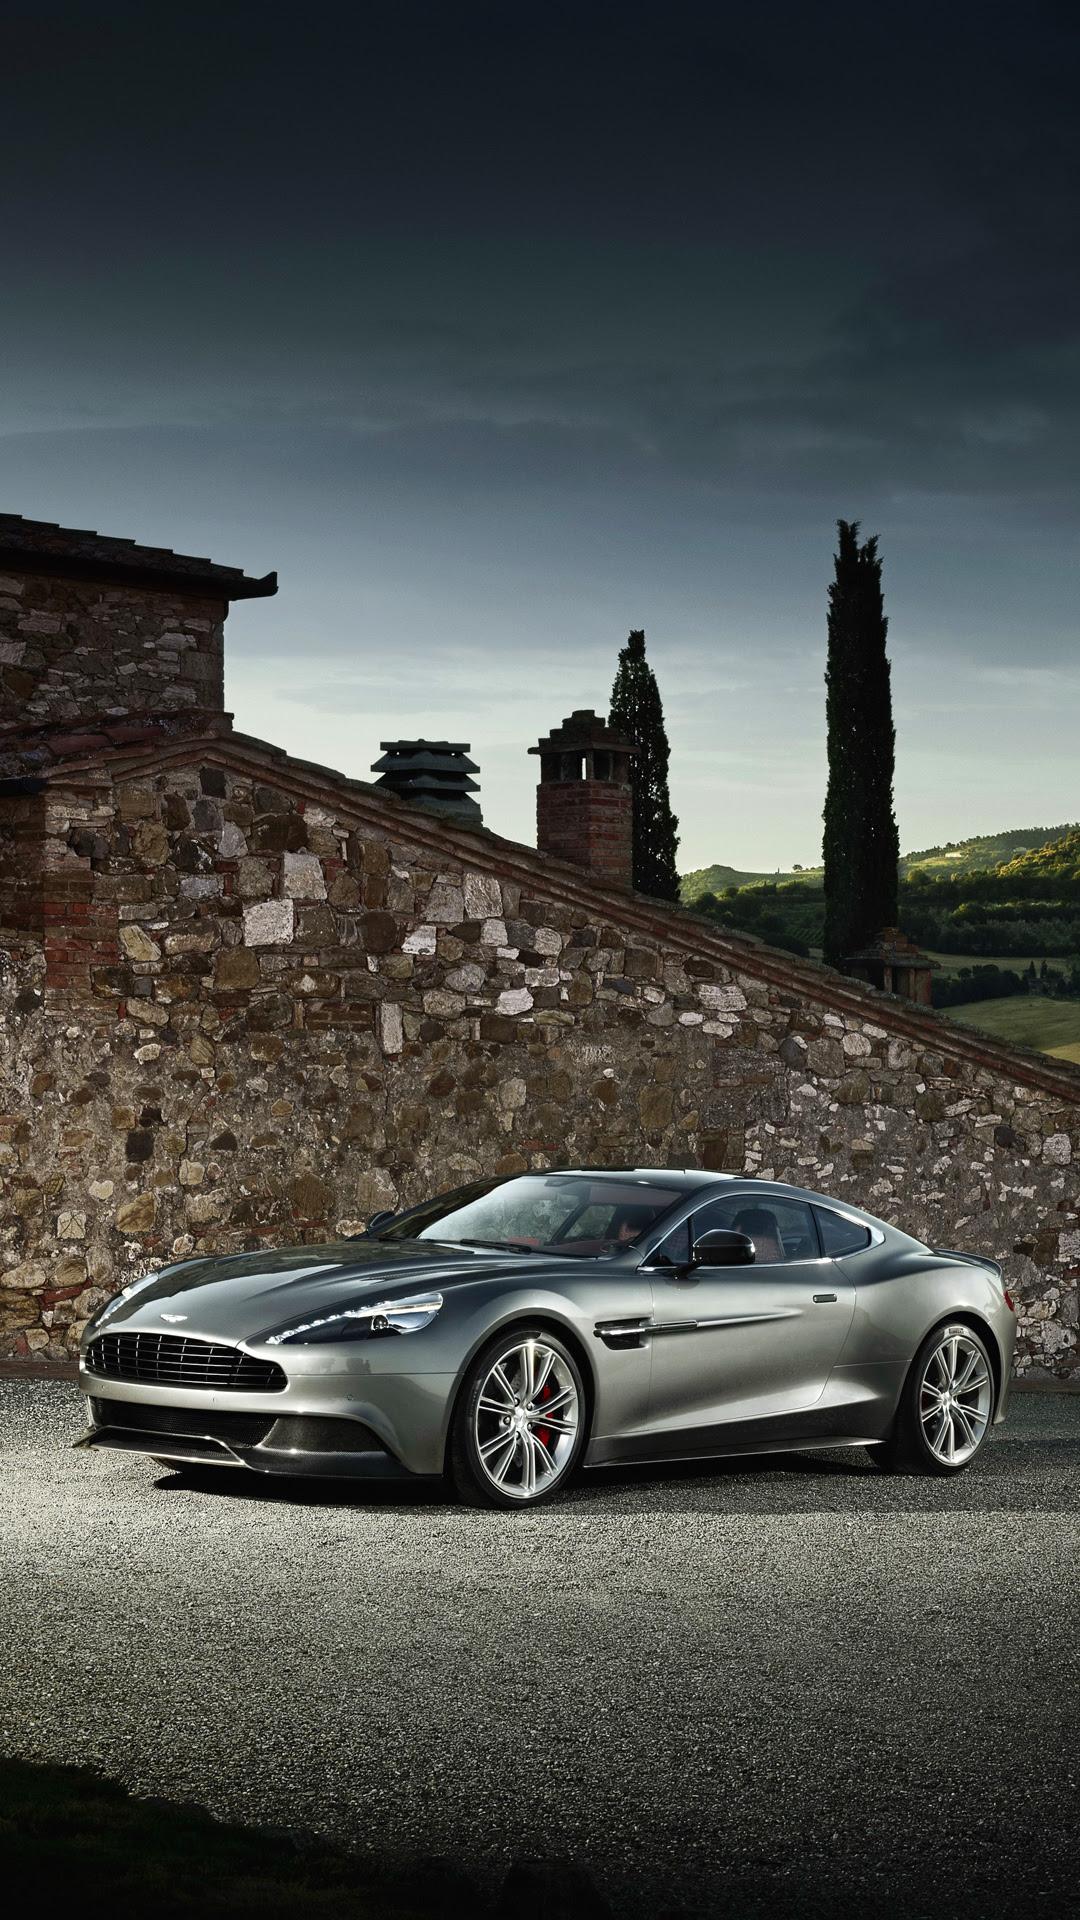 Aston Martin Htc Hd Wallpaper For Htc One